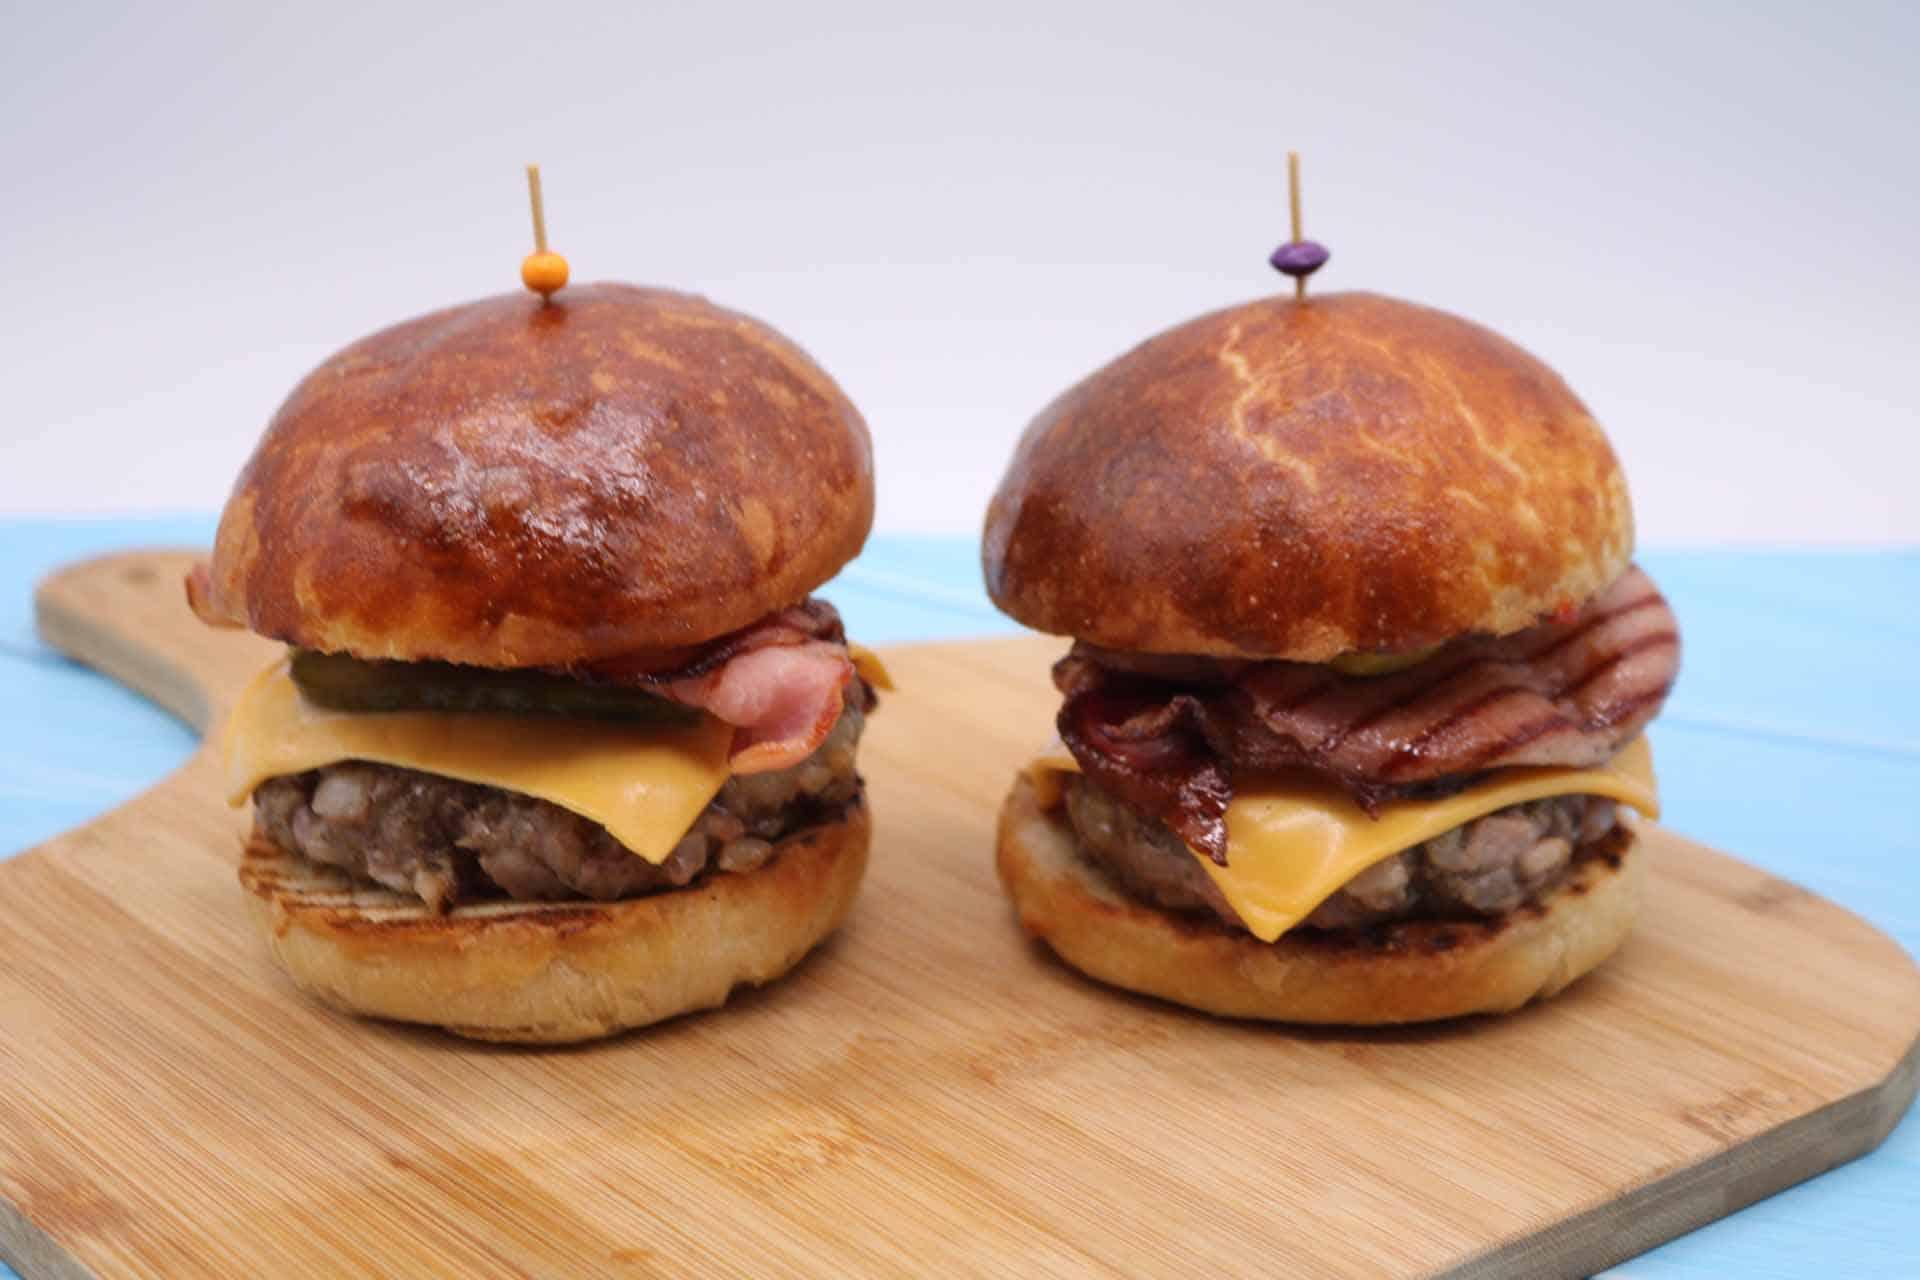 Steak and Bacon Burger, Steak and Bacon Burger